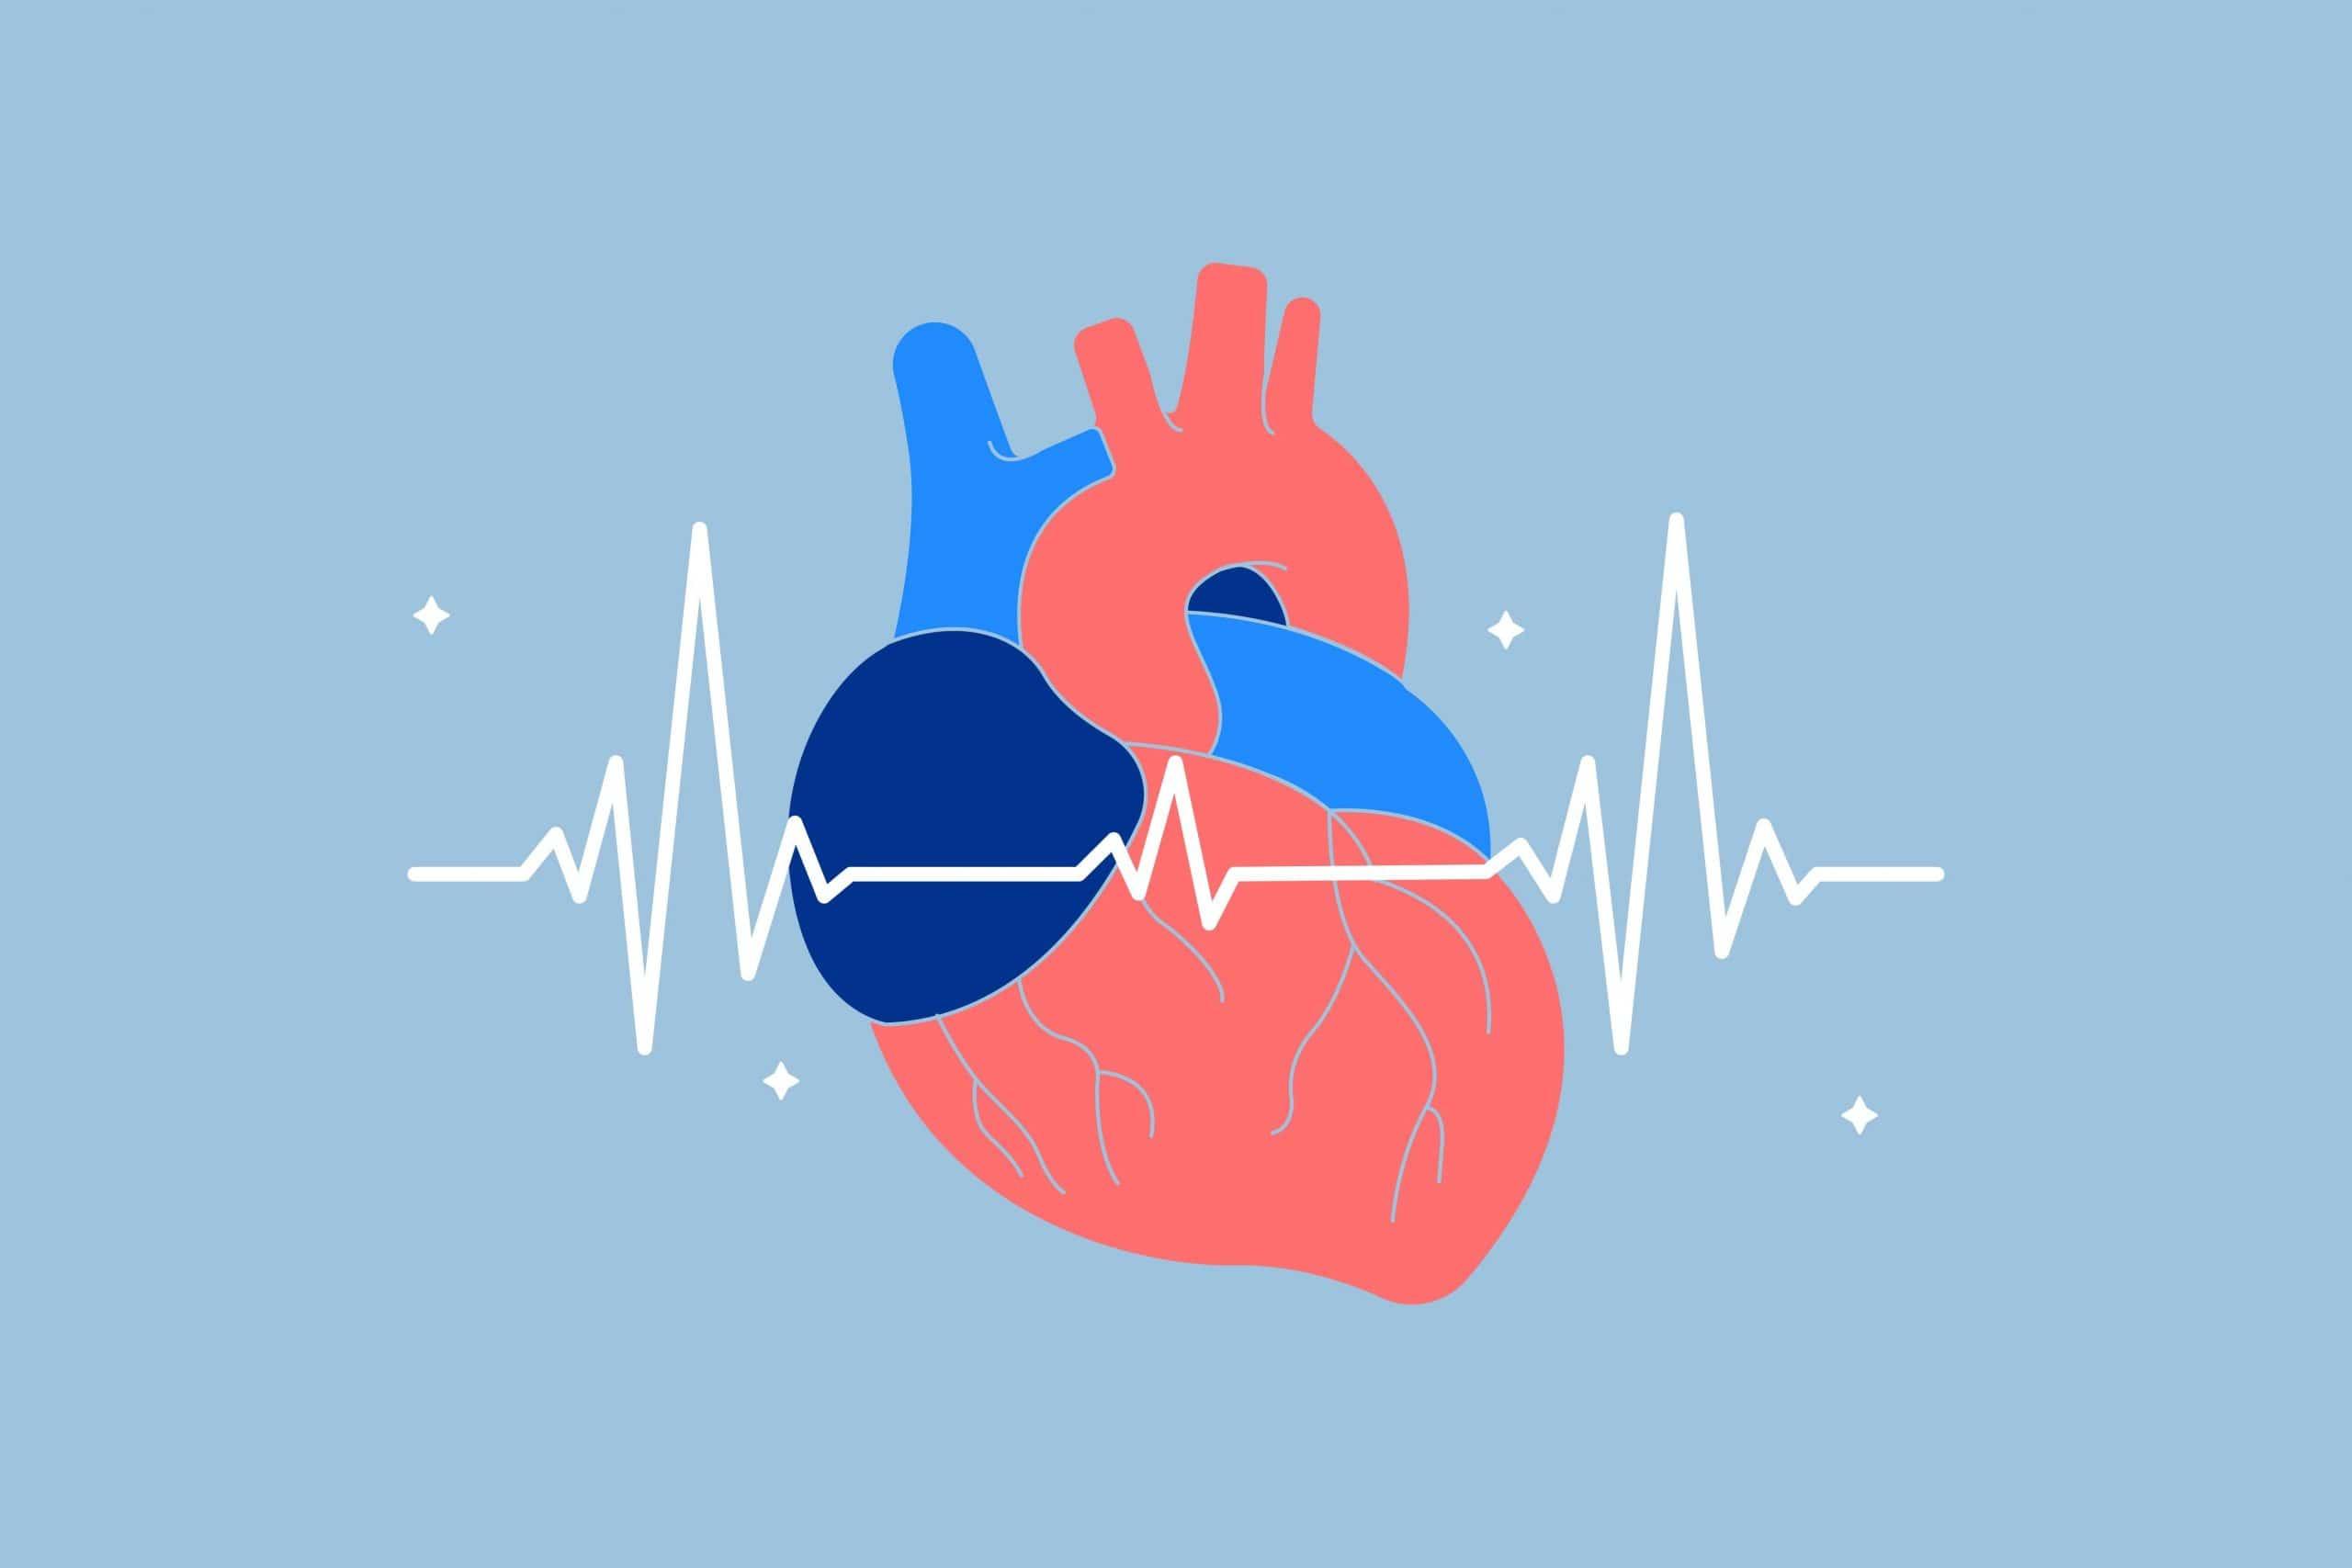 Heart Rate Variability and Sleep